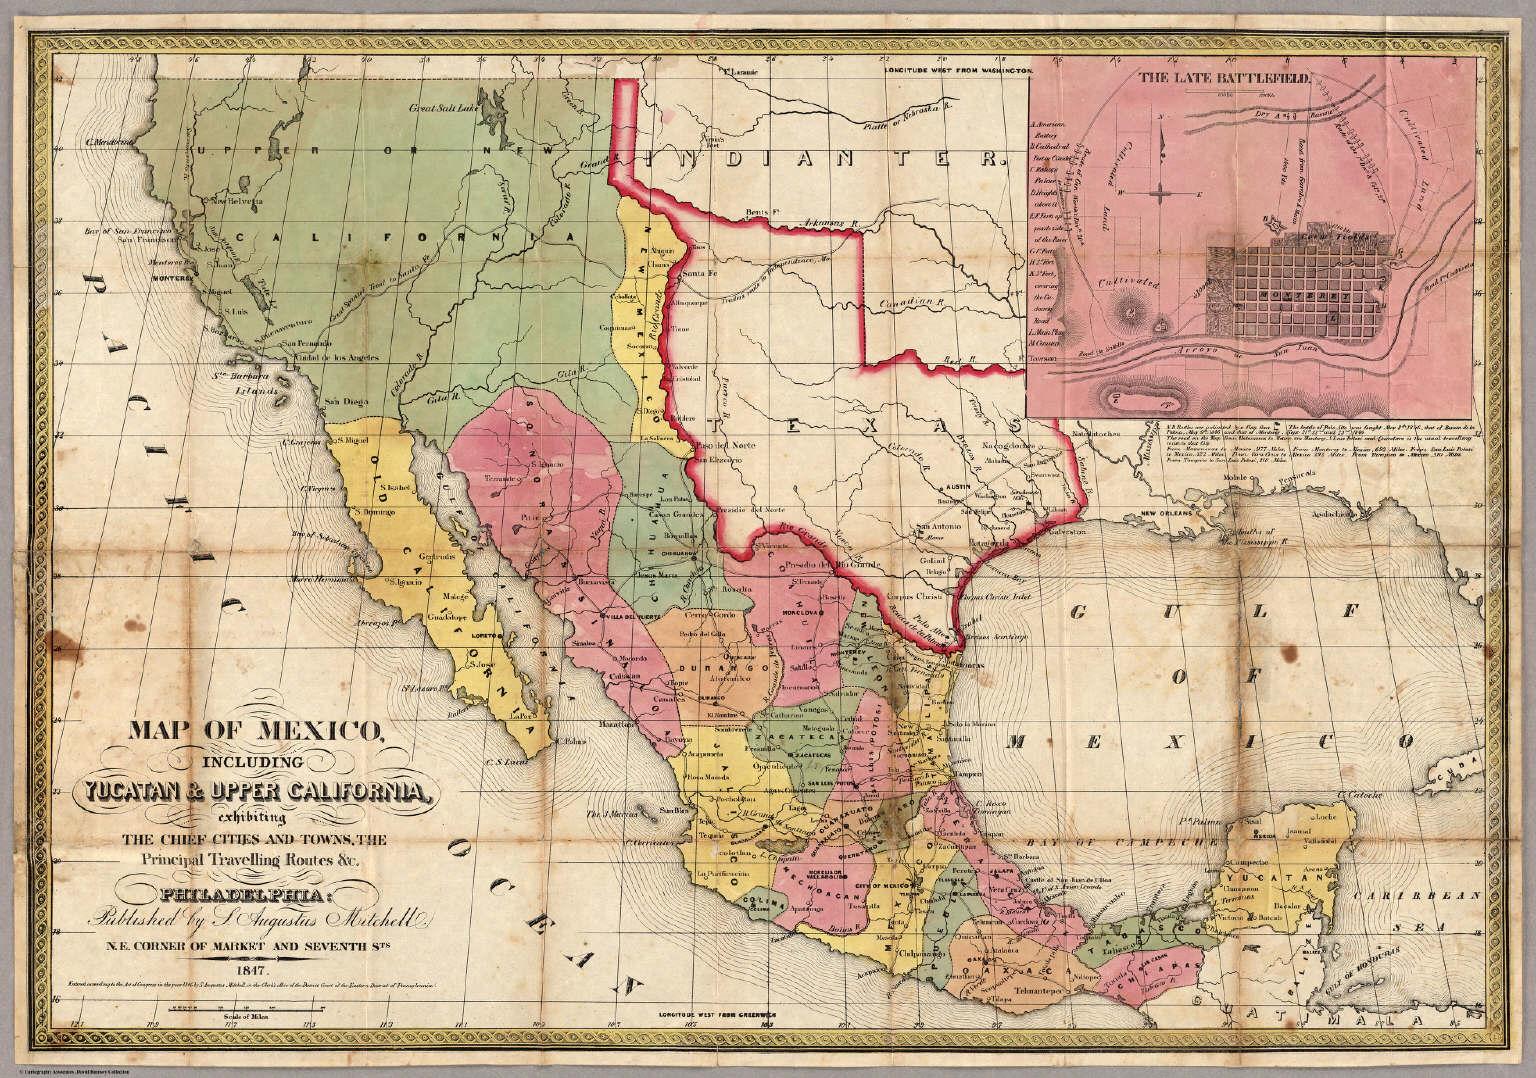 Map Of Mexico Including Yucatan Upper California David Rumsey